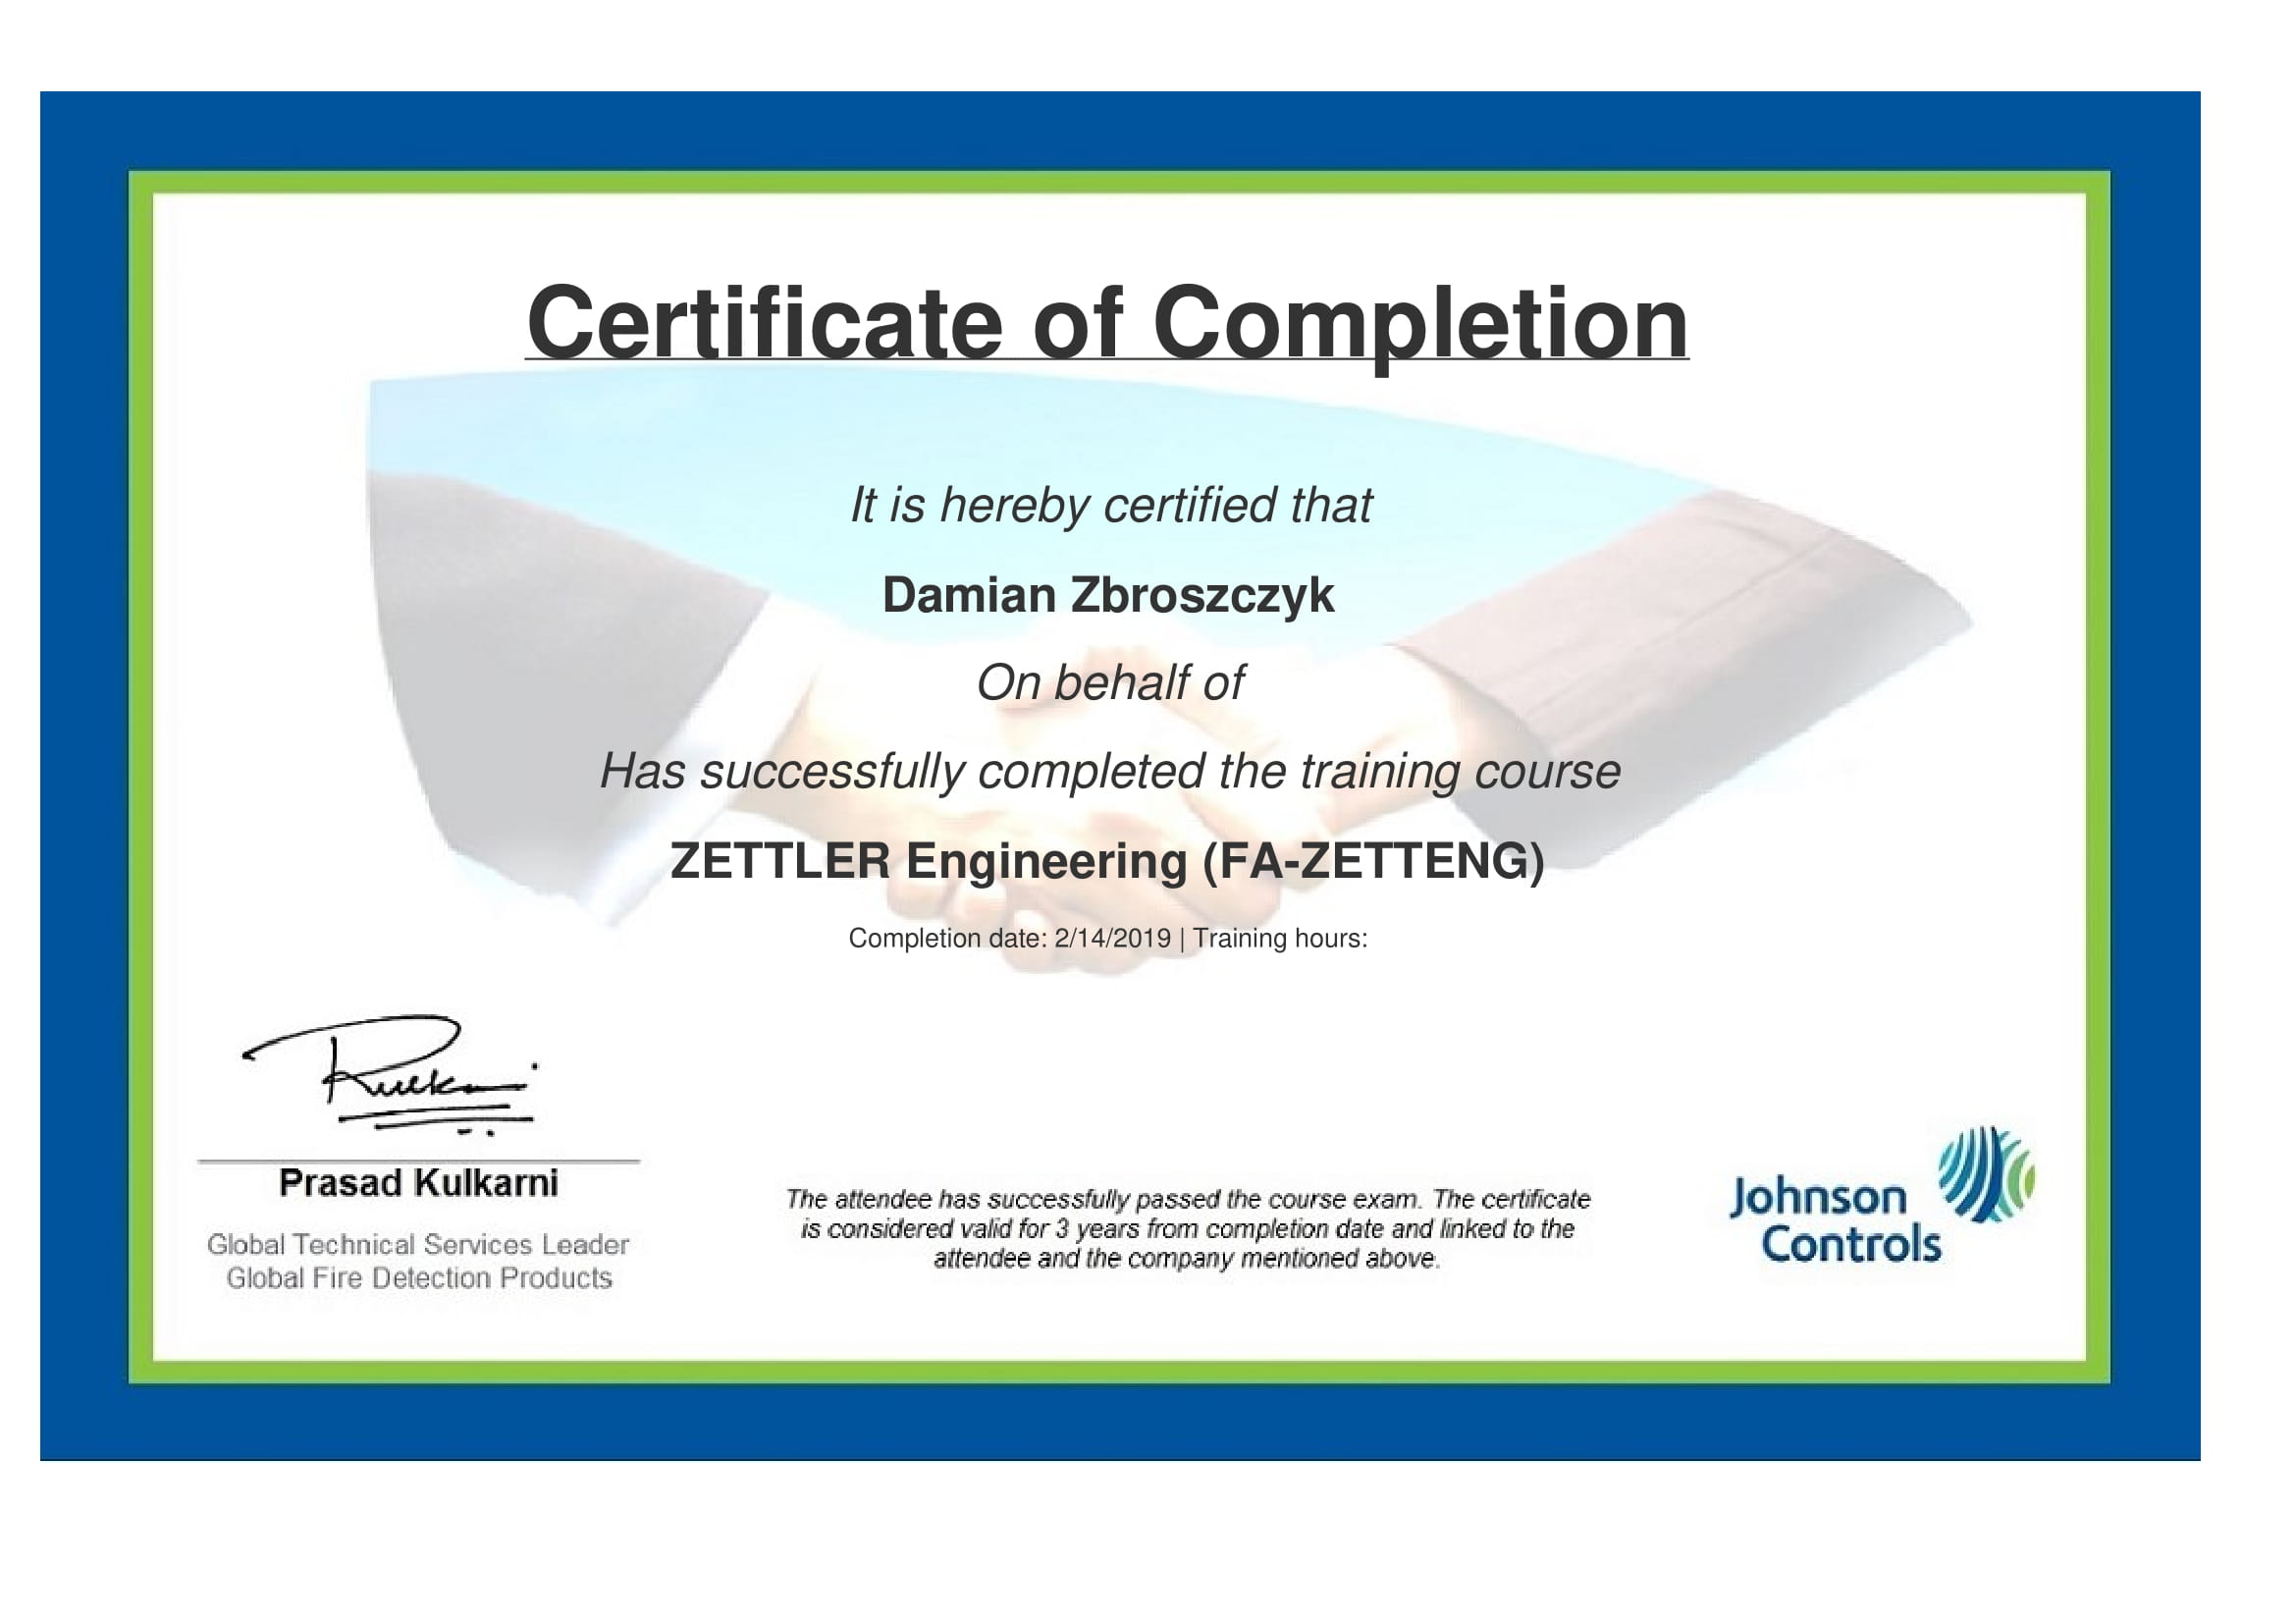 ZETTLER_Zbroszczyk-1